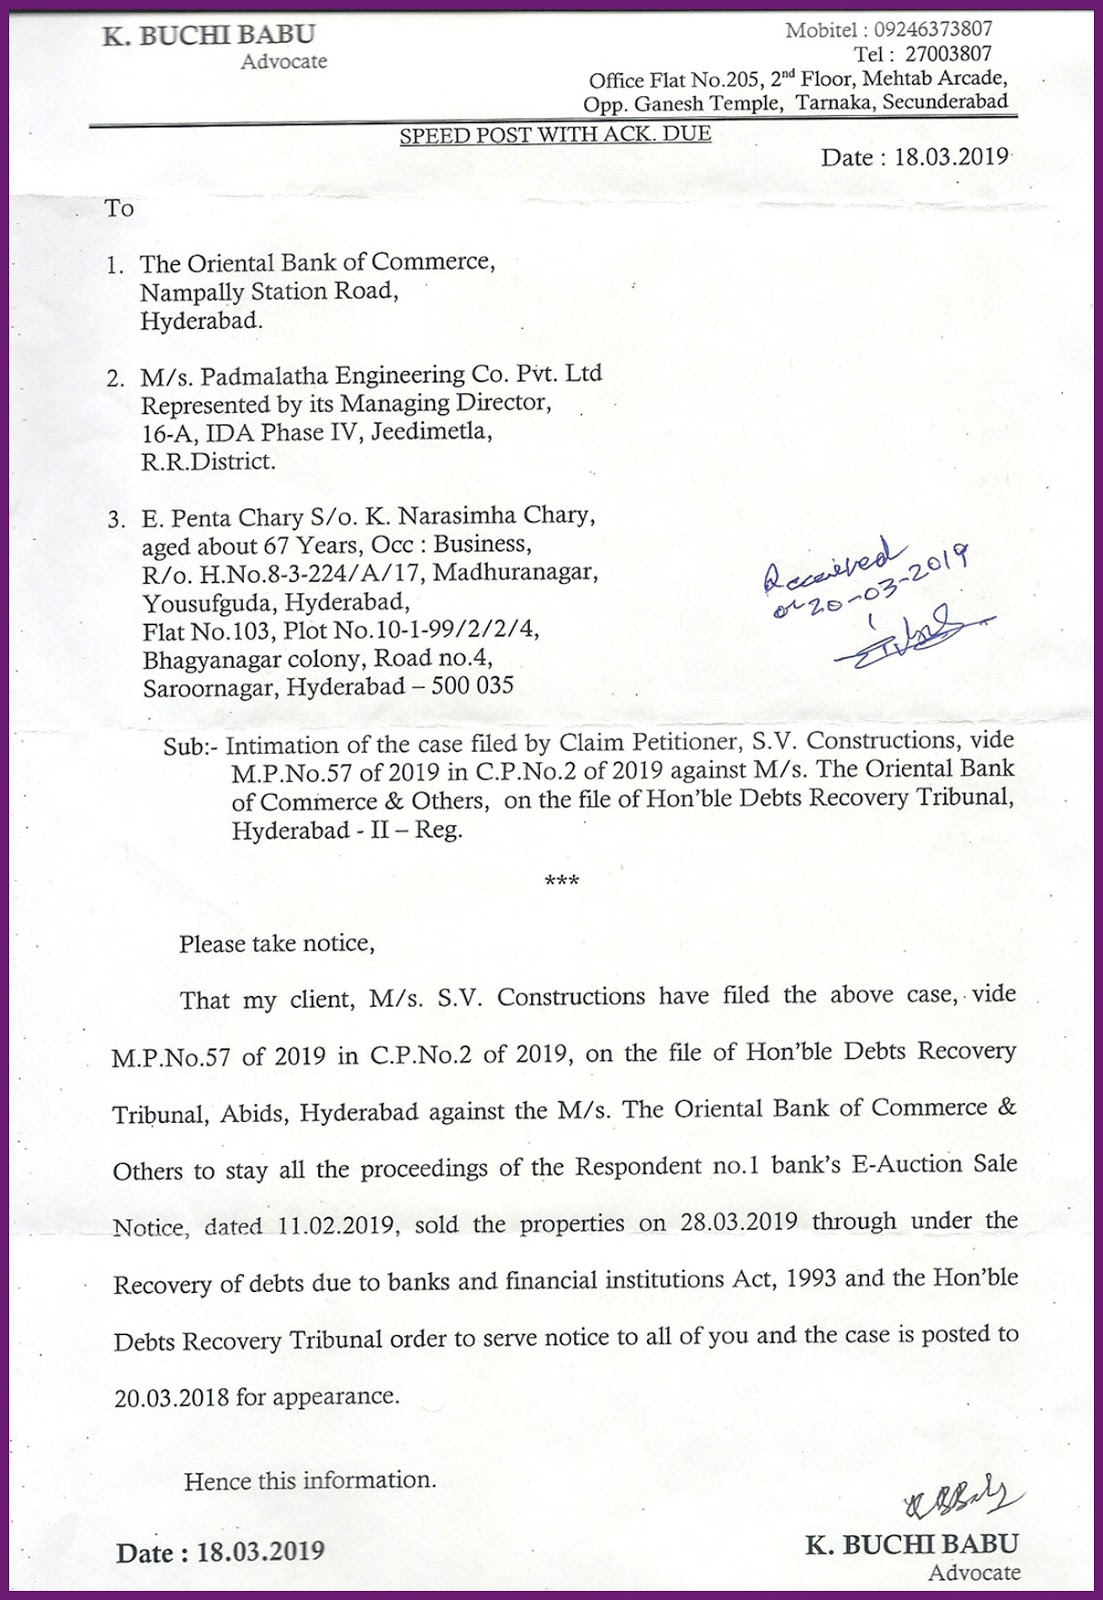 K.Buchi Babu Advocate, Debts Recovery Tribunal-Hyderabad